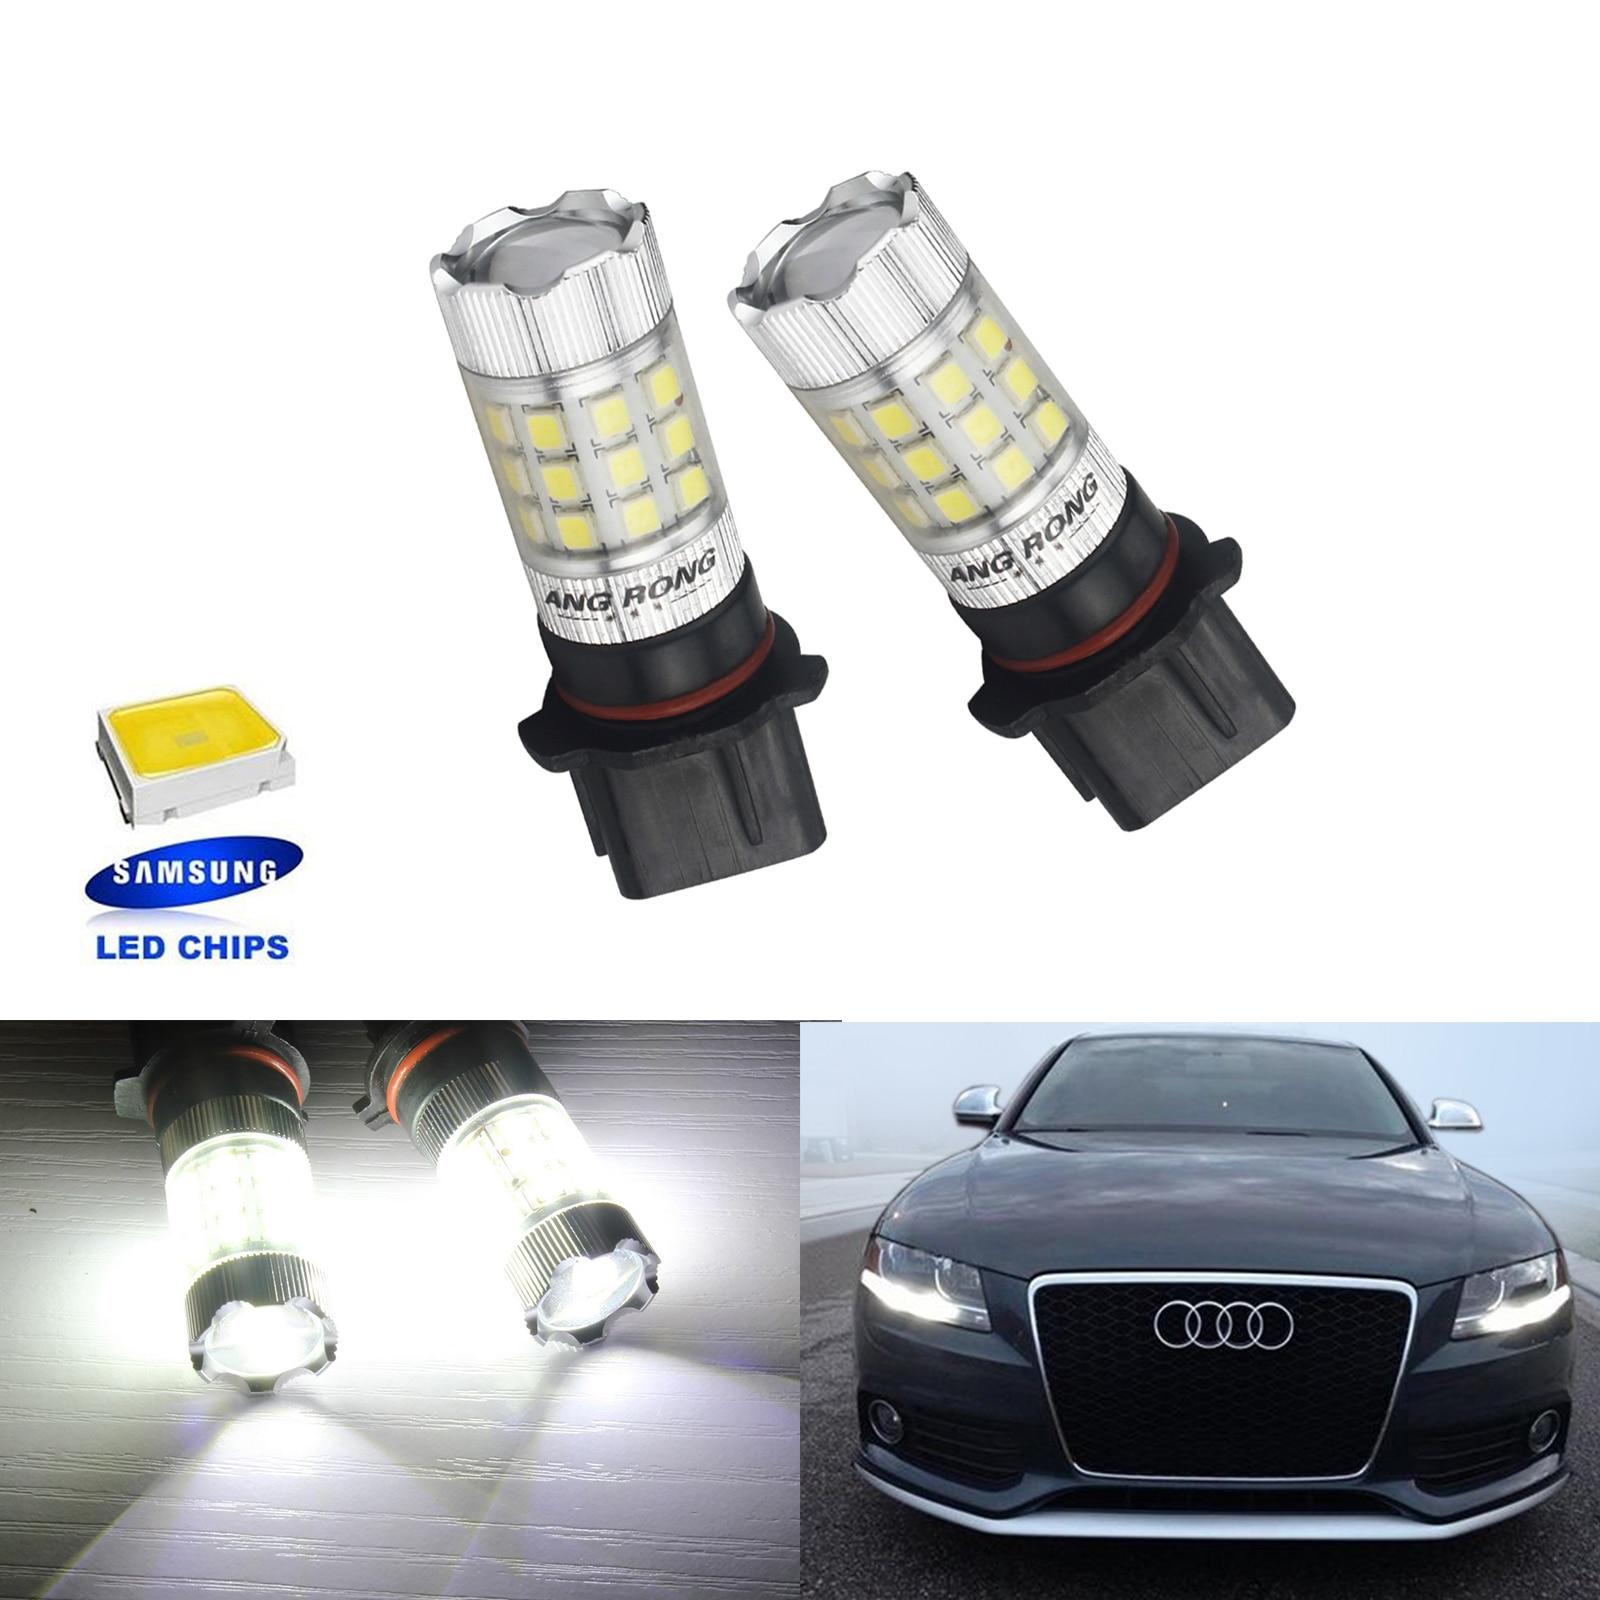 Audi A6 Allroad C6 White LED Superlux Side Light Beam Bulbs Pair Upgrade